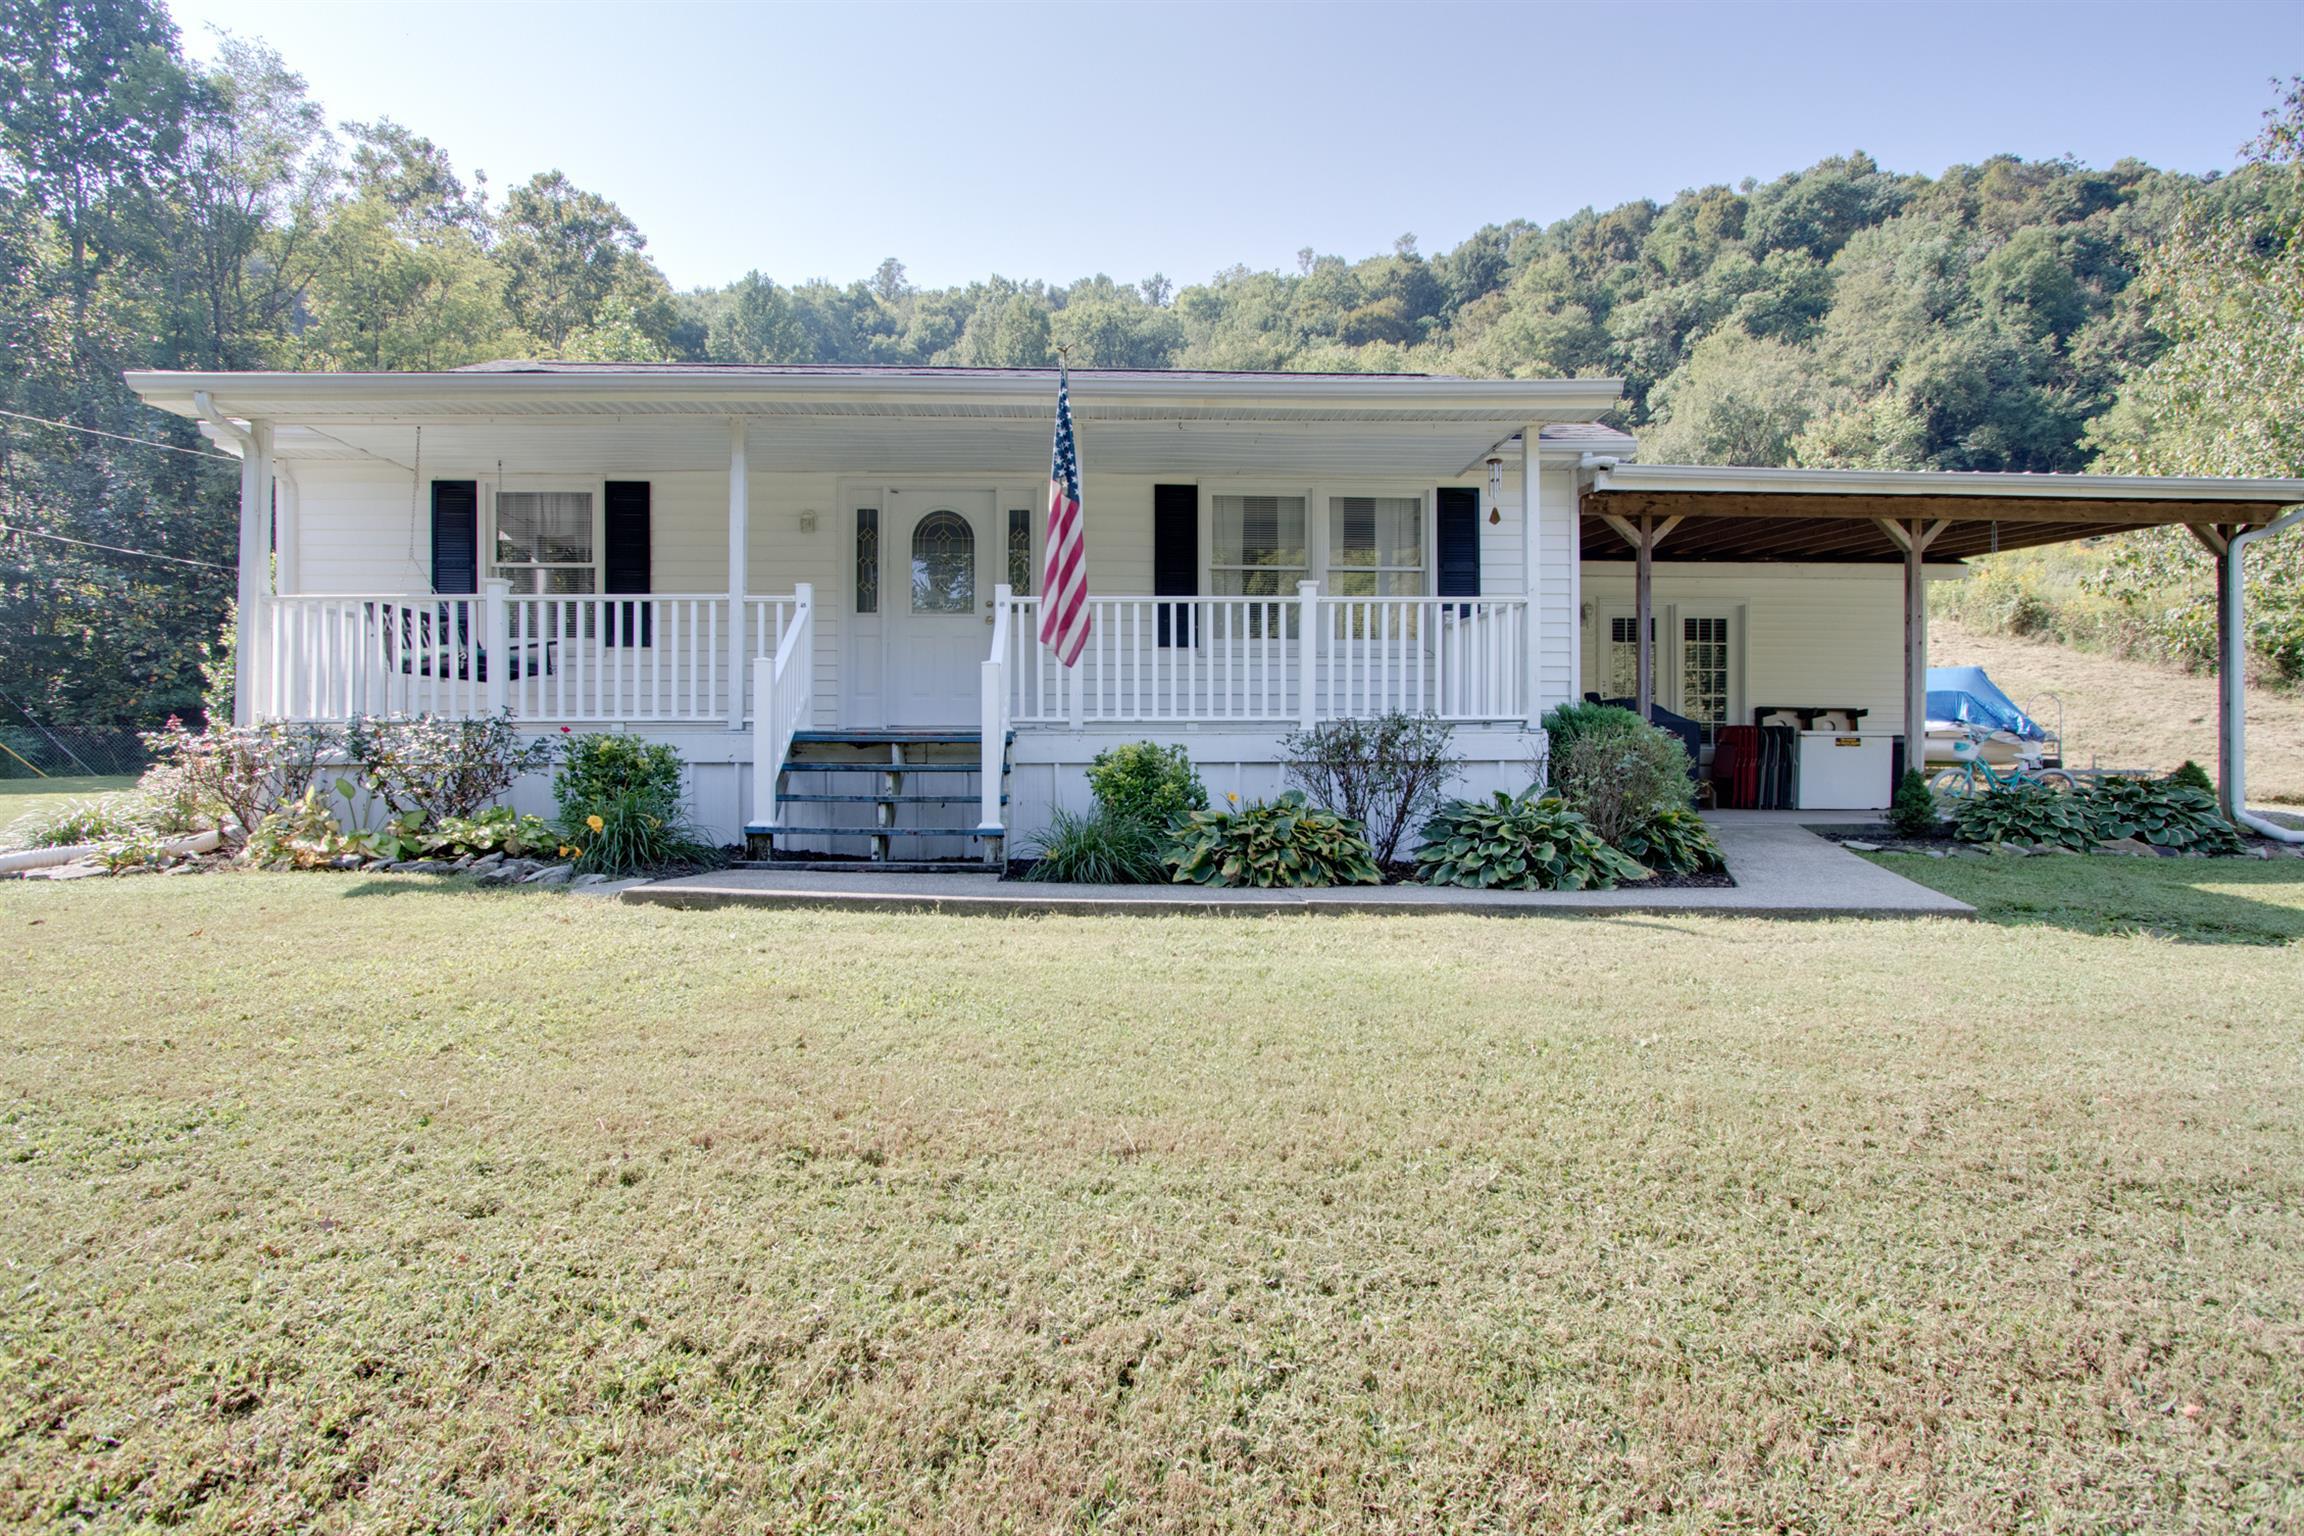 265 Nickajack Rd, Pleasant Shade, TN 37145 - Pleasant Shade, TN real estate listing